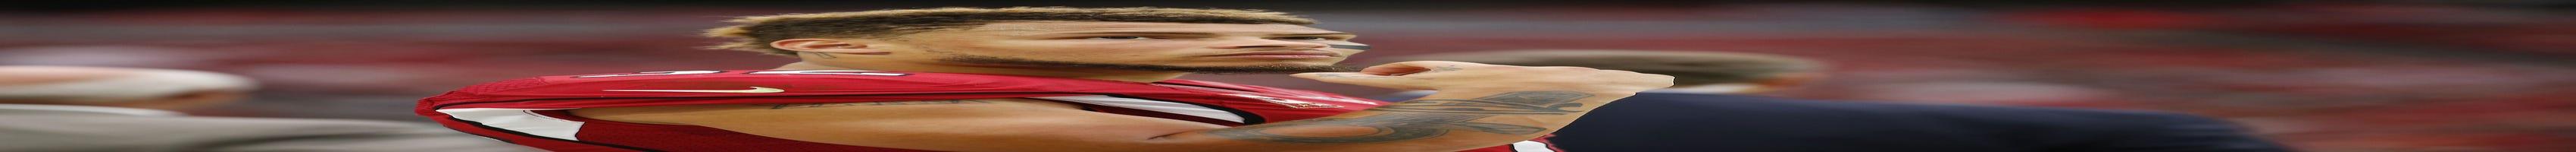 Cardinals' Mathieu mulls Honey Badger return